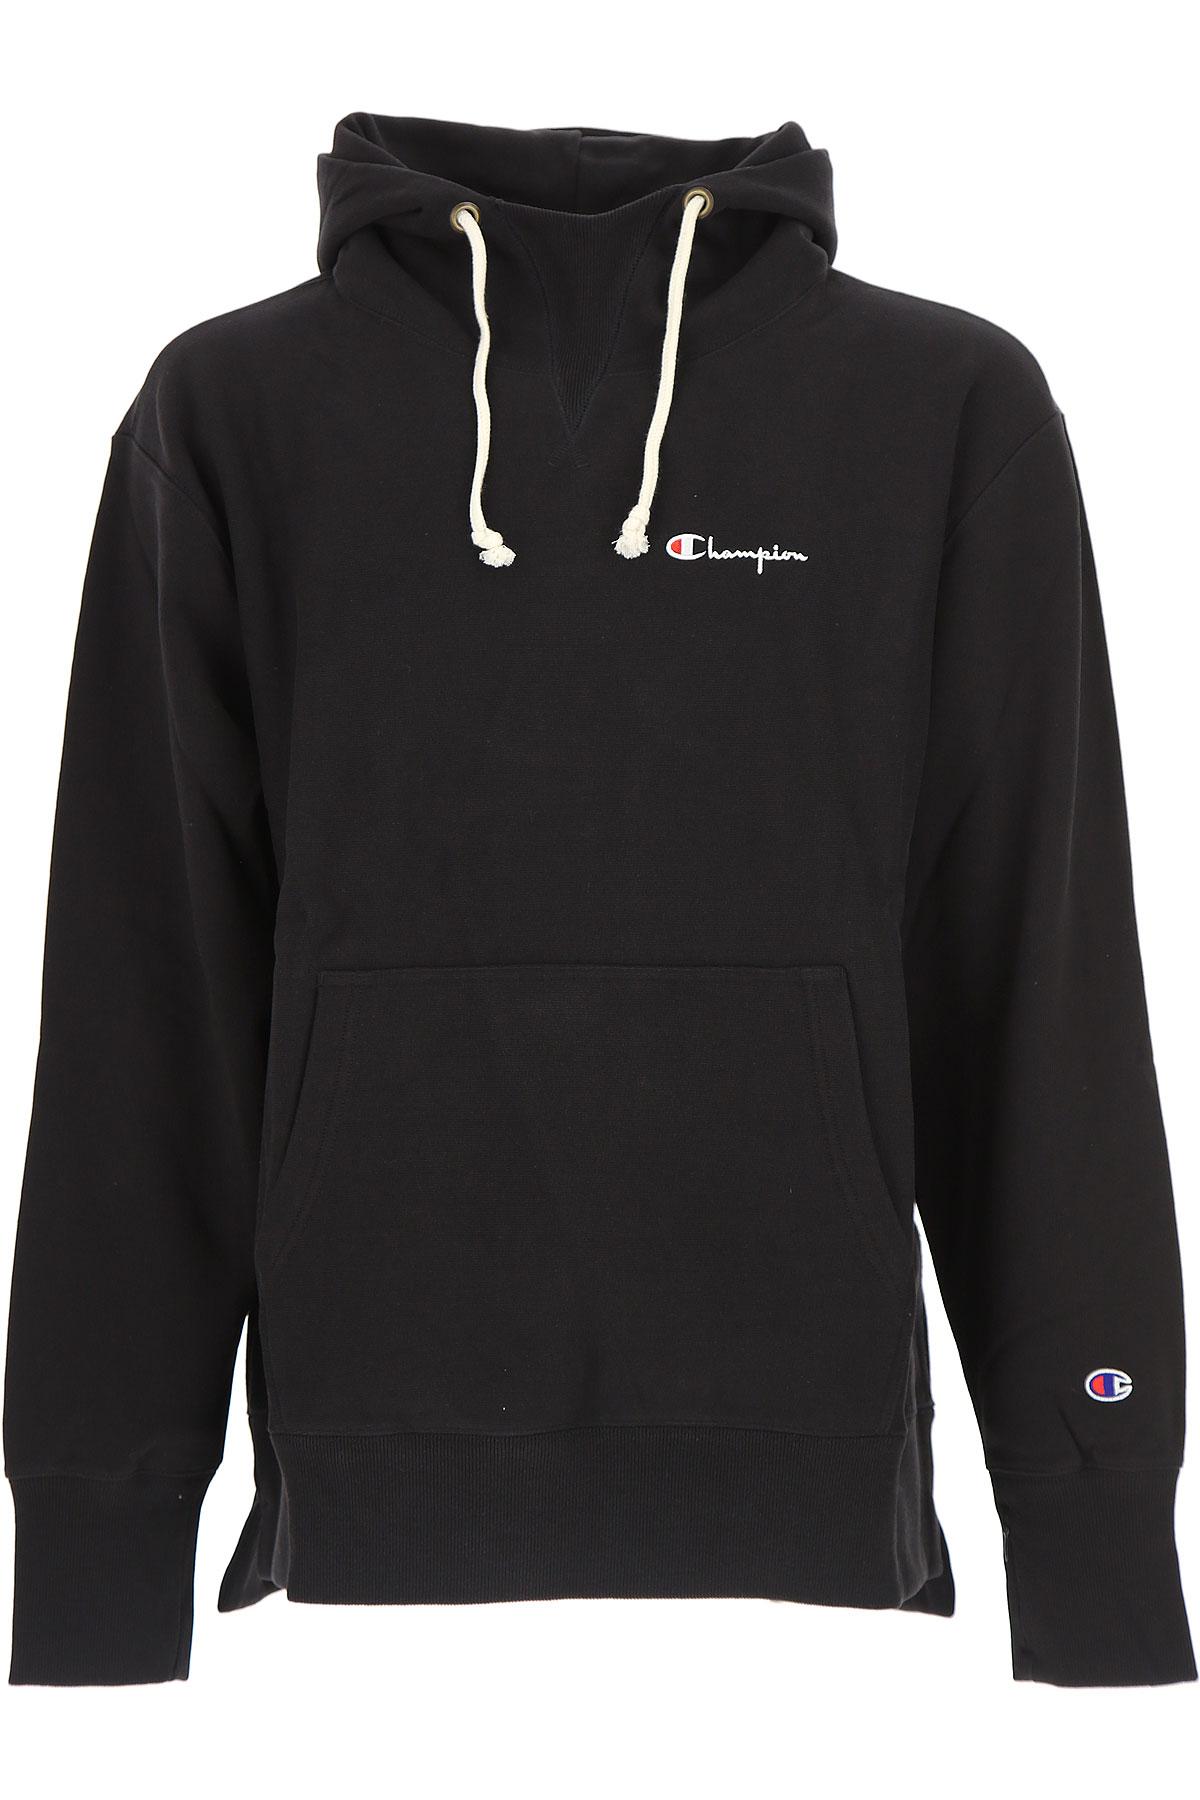 Champion Sweatshirt for Men On Sale, Black, Cotton, 2017, L M S XL USA-454766